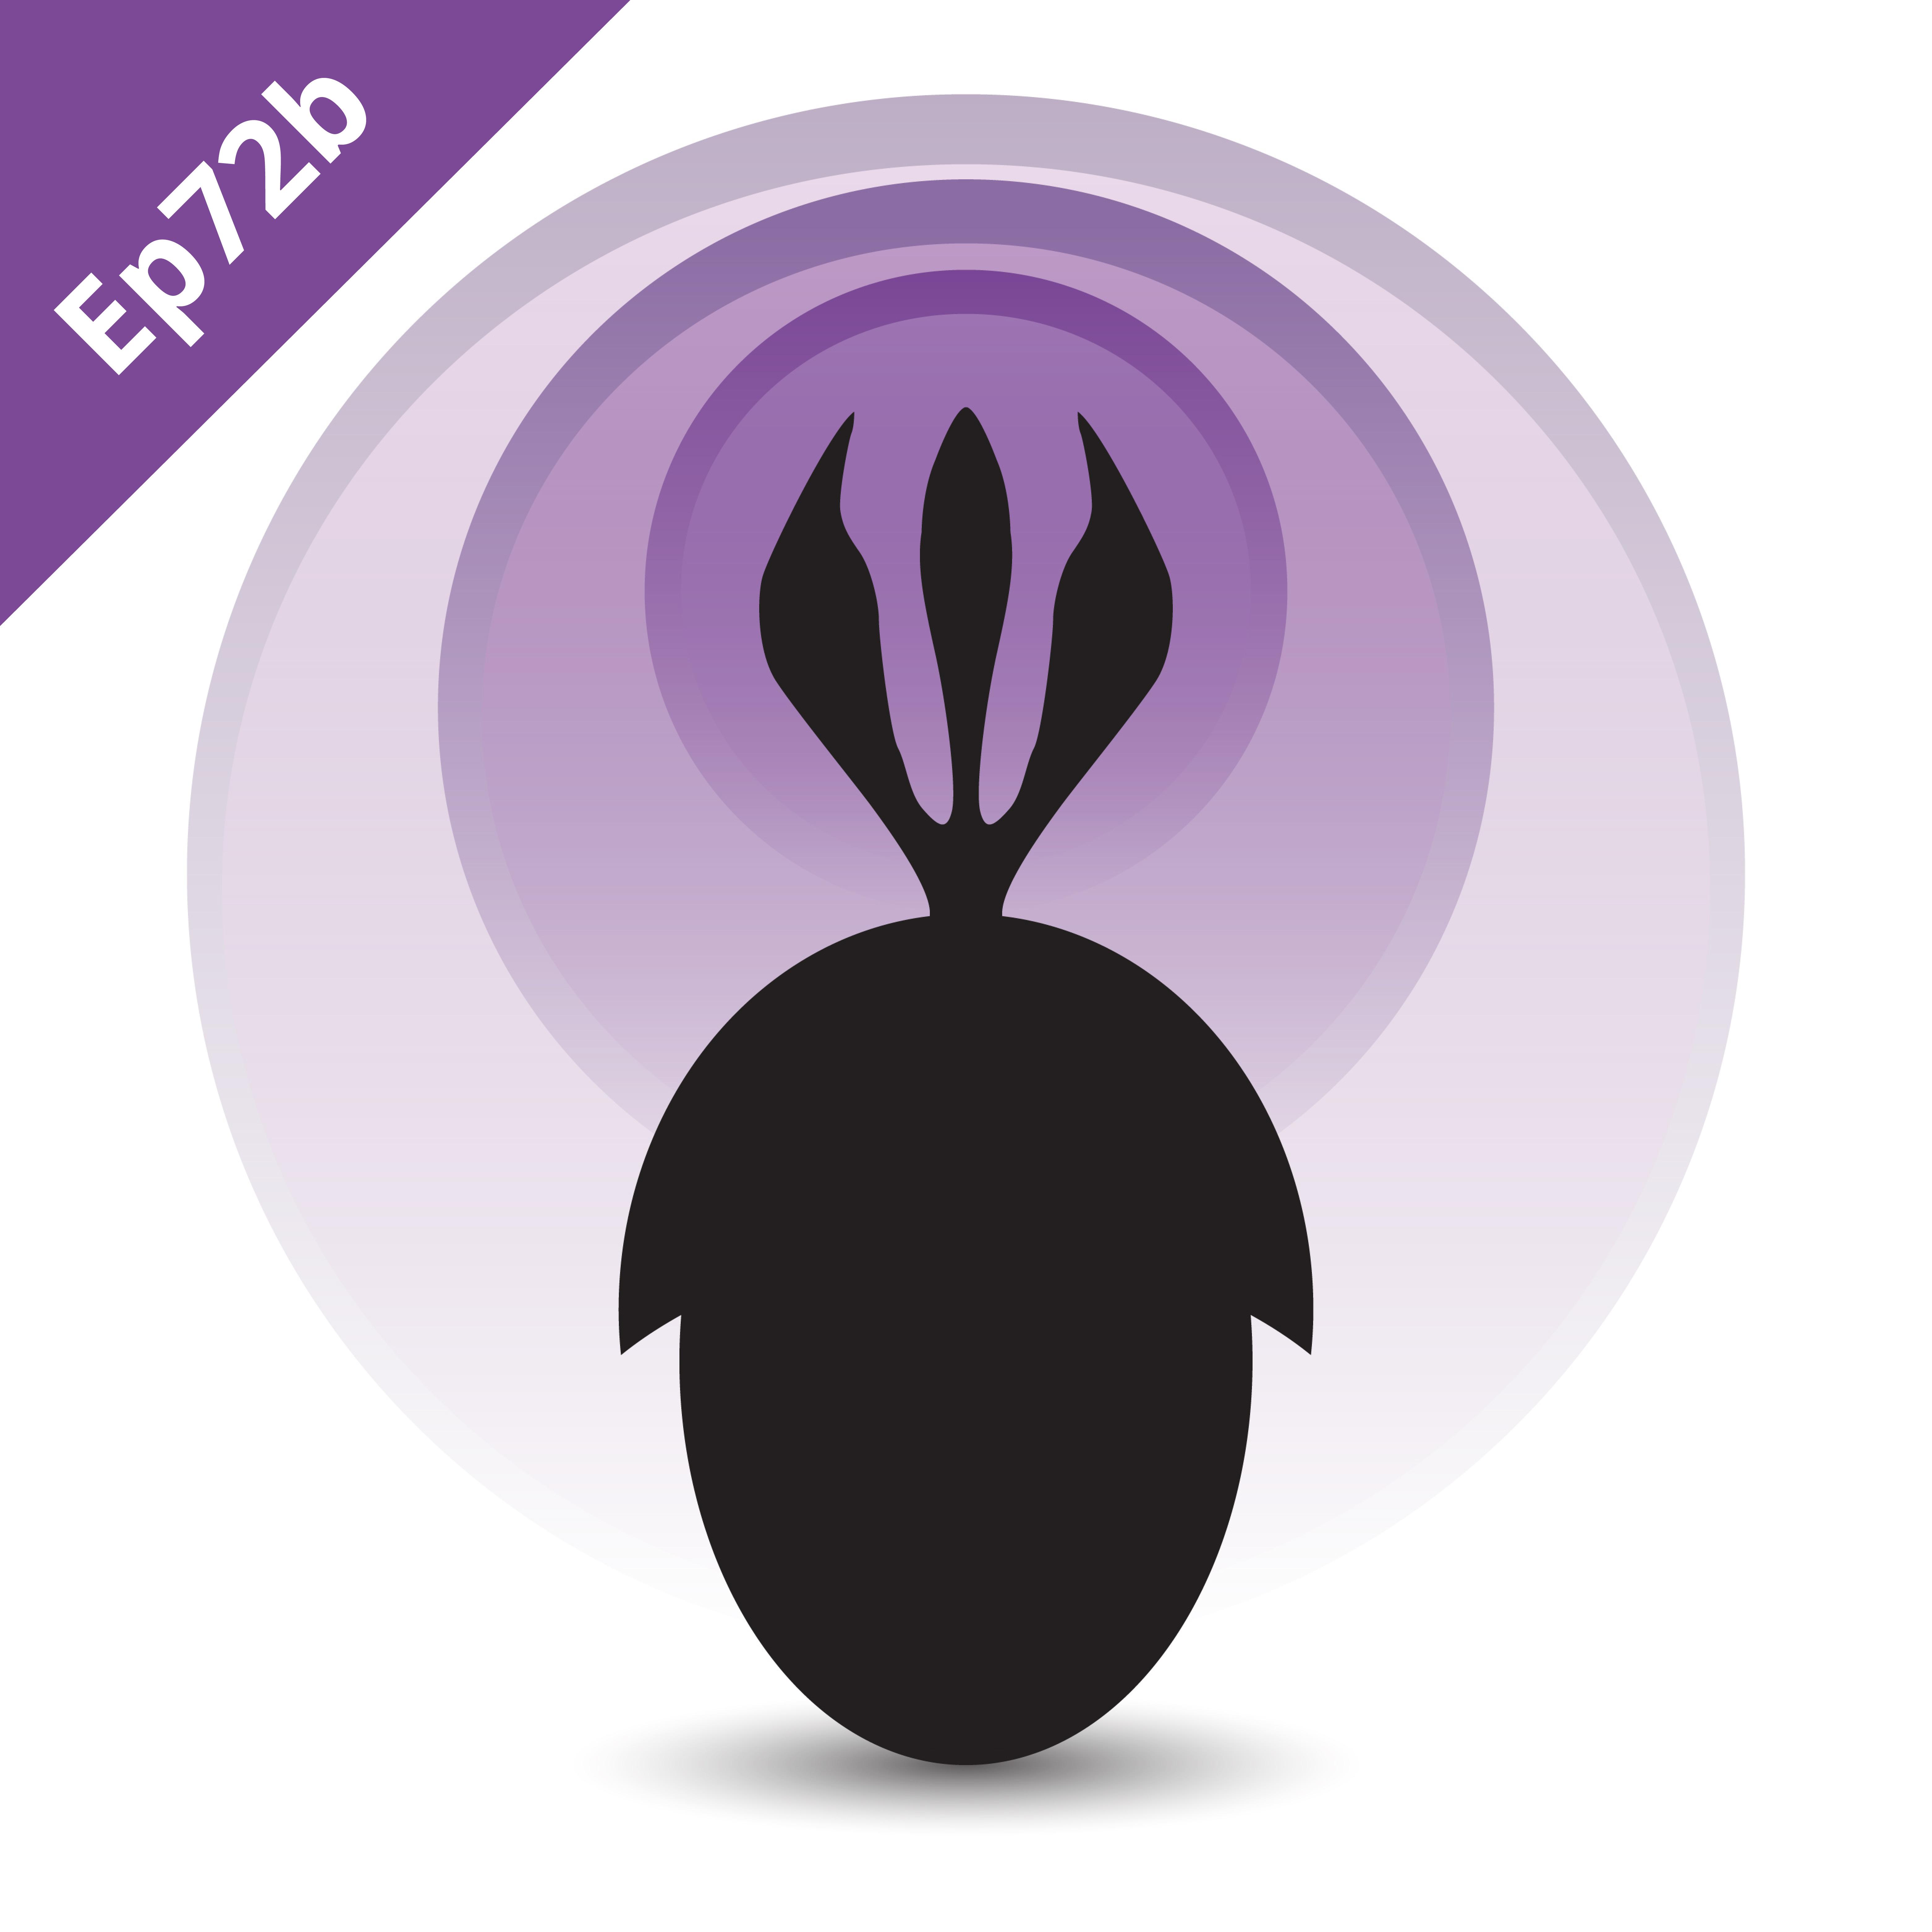 Episode 72b: Las Hoyas